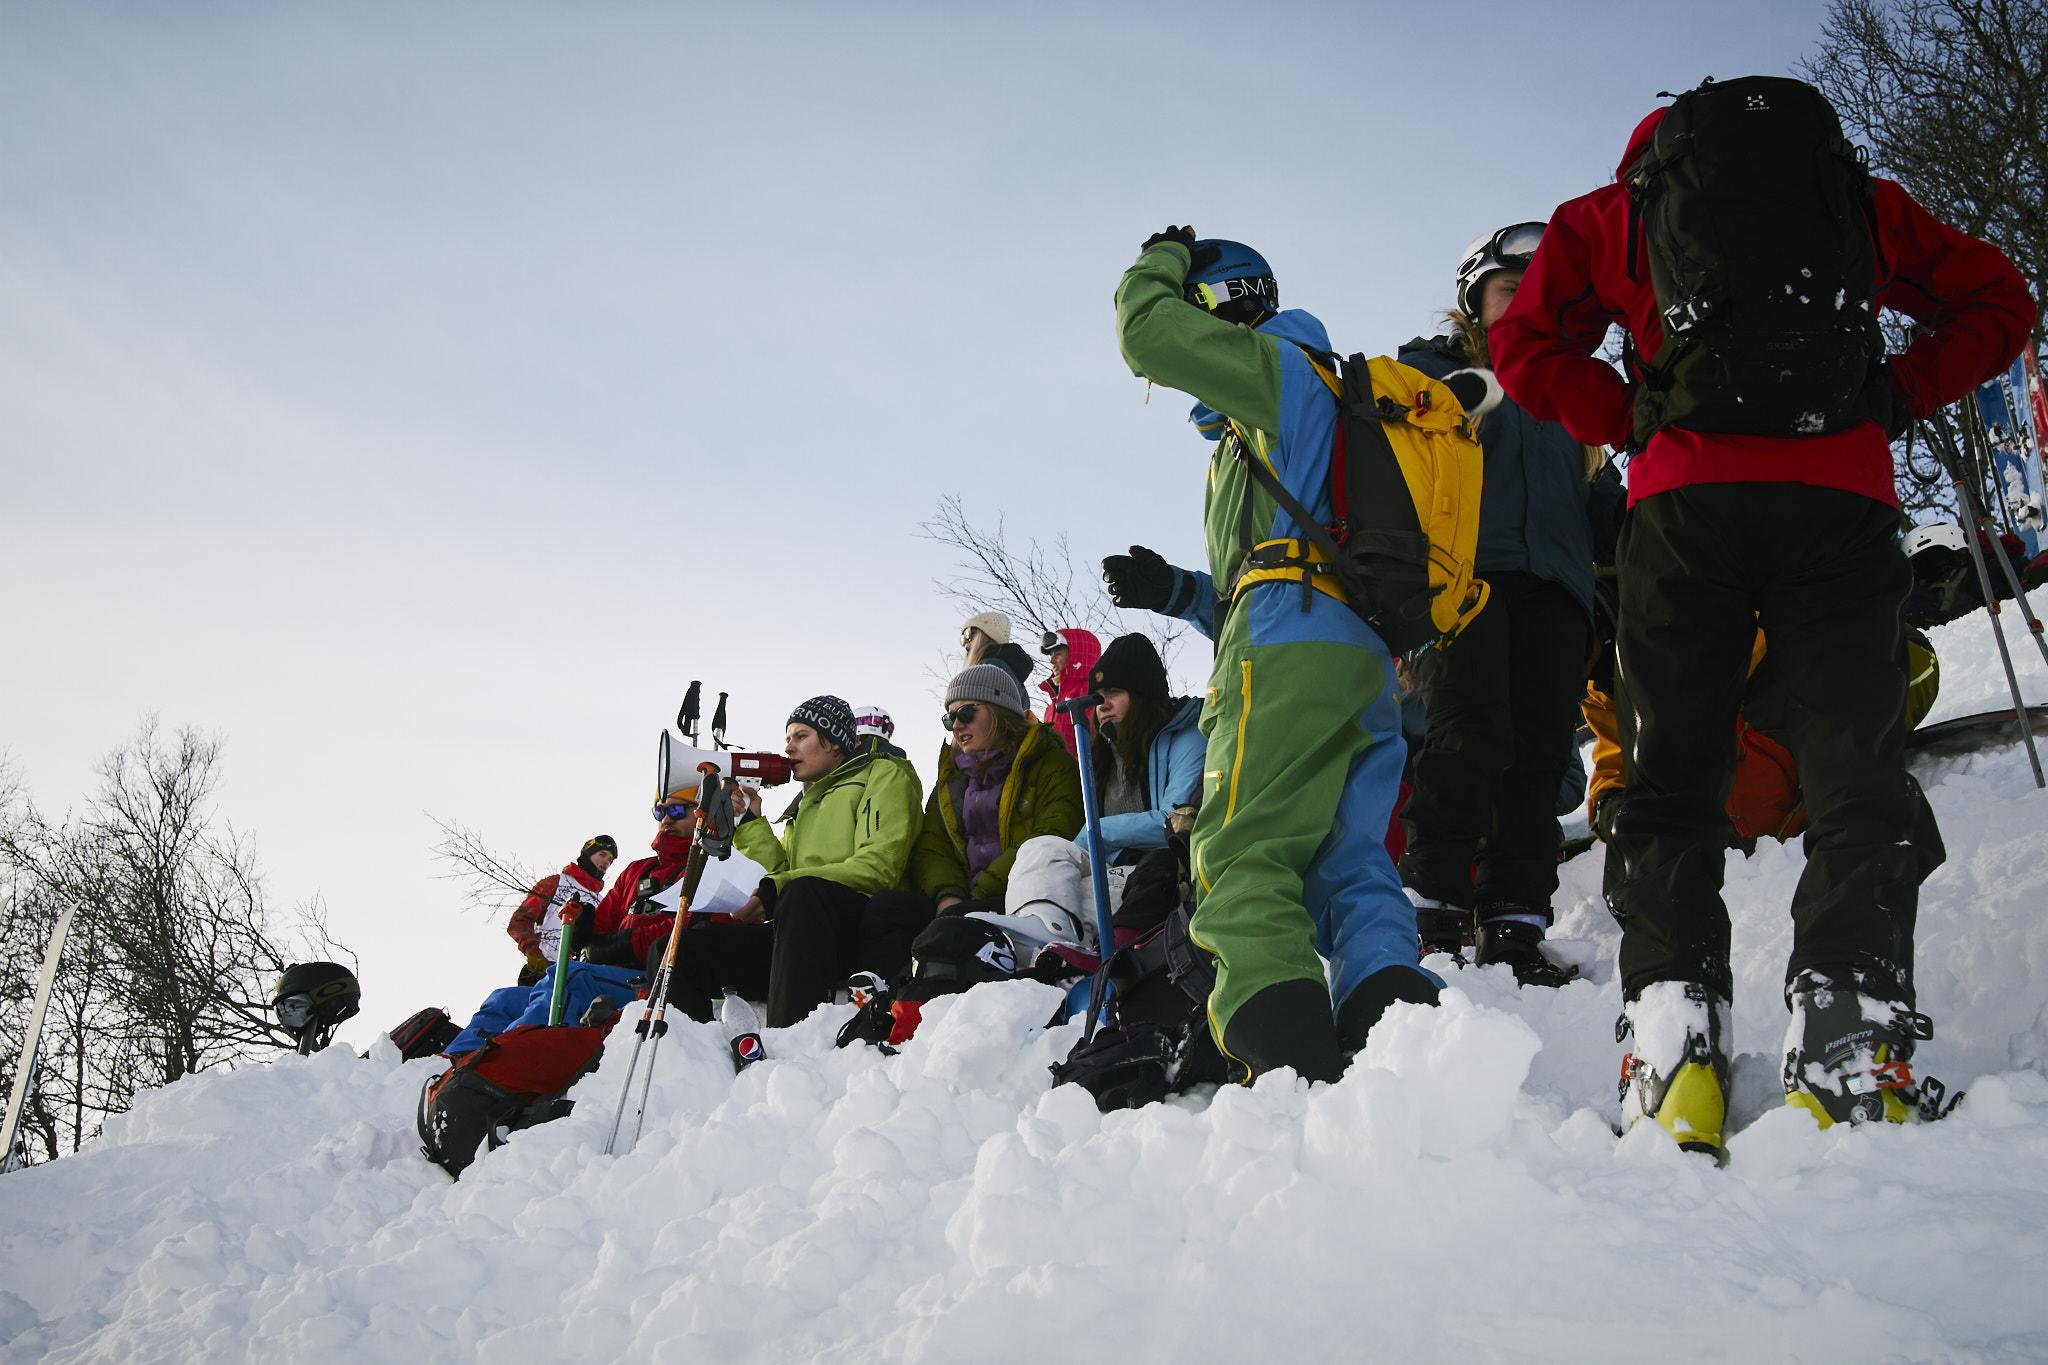 2018.02.22-Fjellsportfestival-RakkarOpen-PetterOlsen-008.jpg